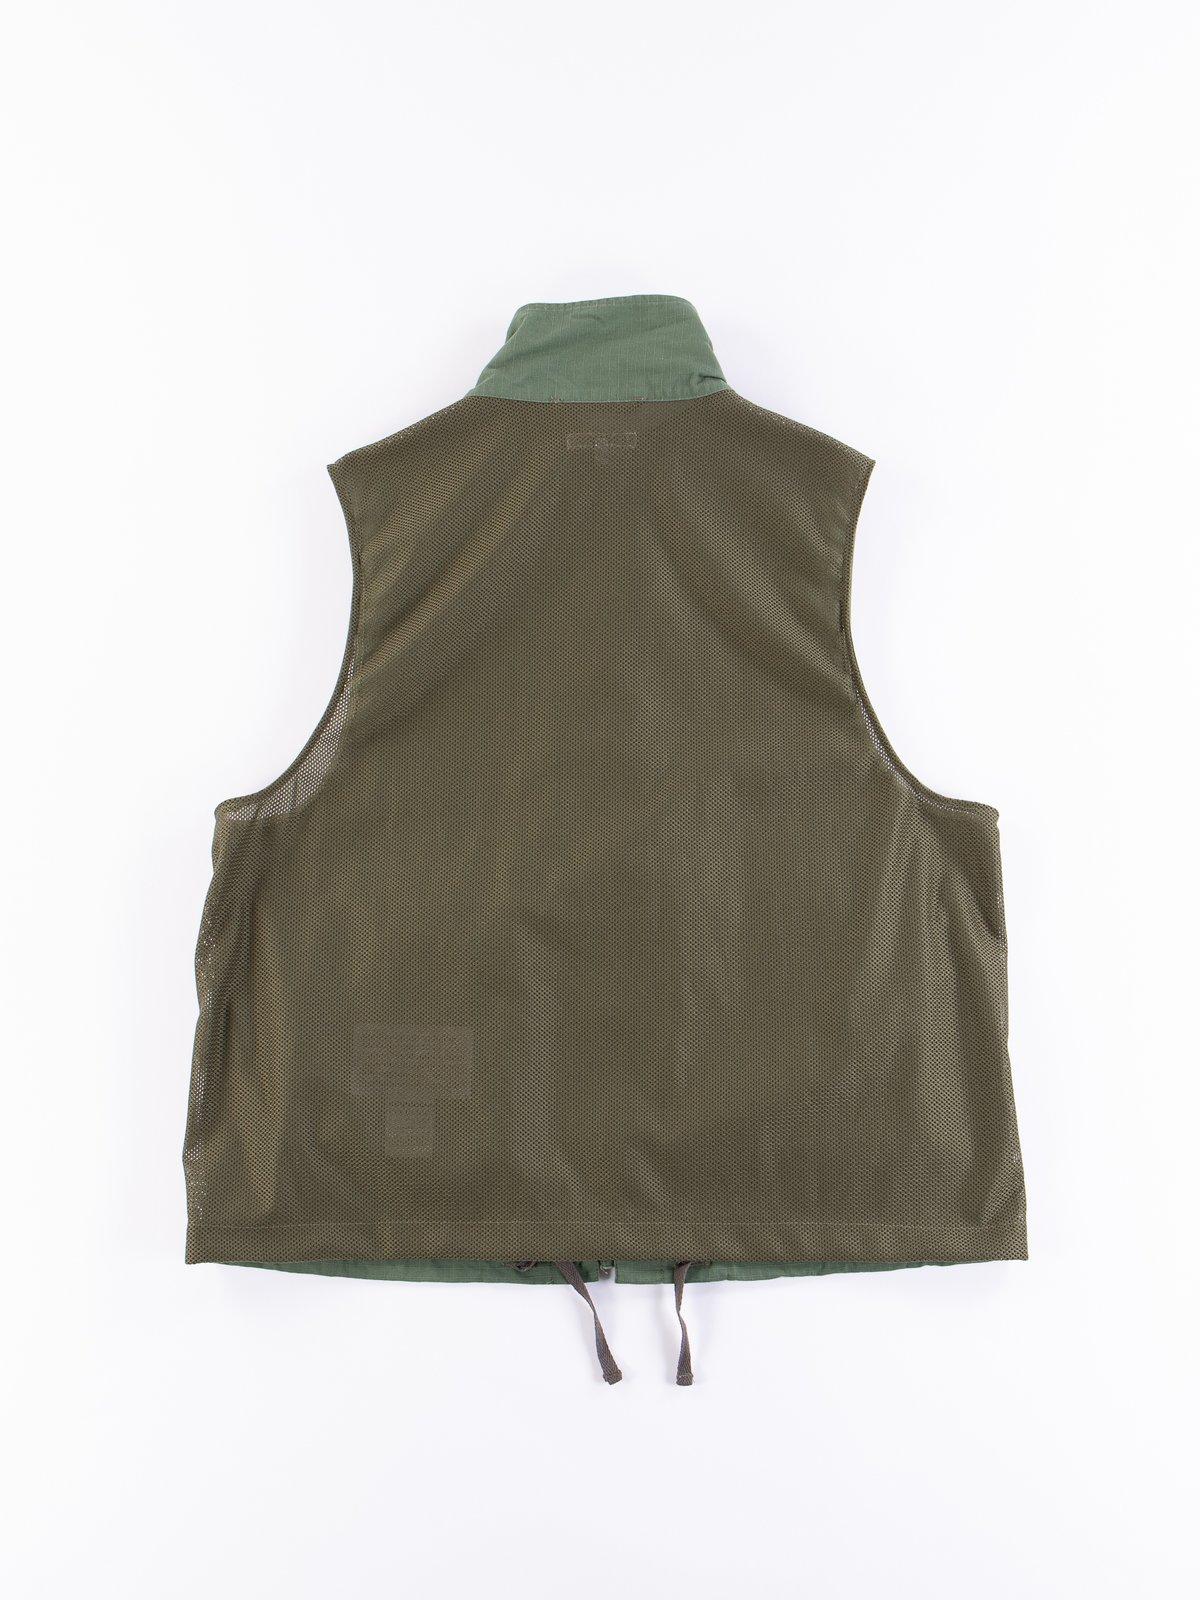 Olive Cotton Ripstop Field Vest - Image 5